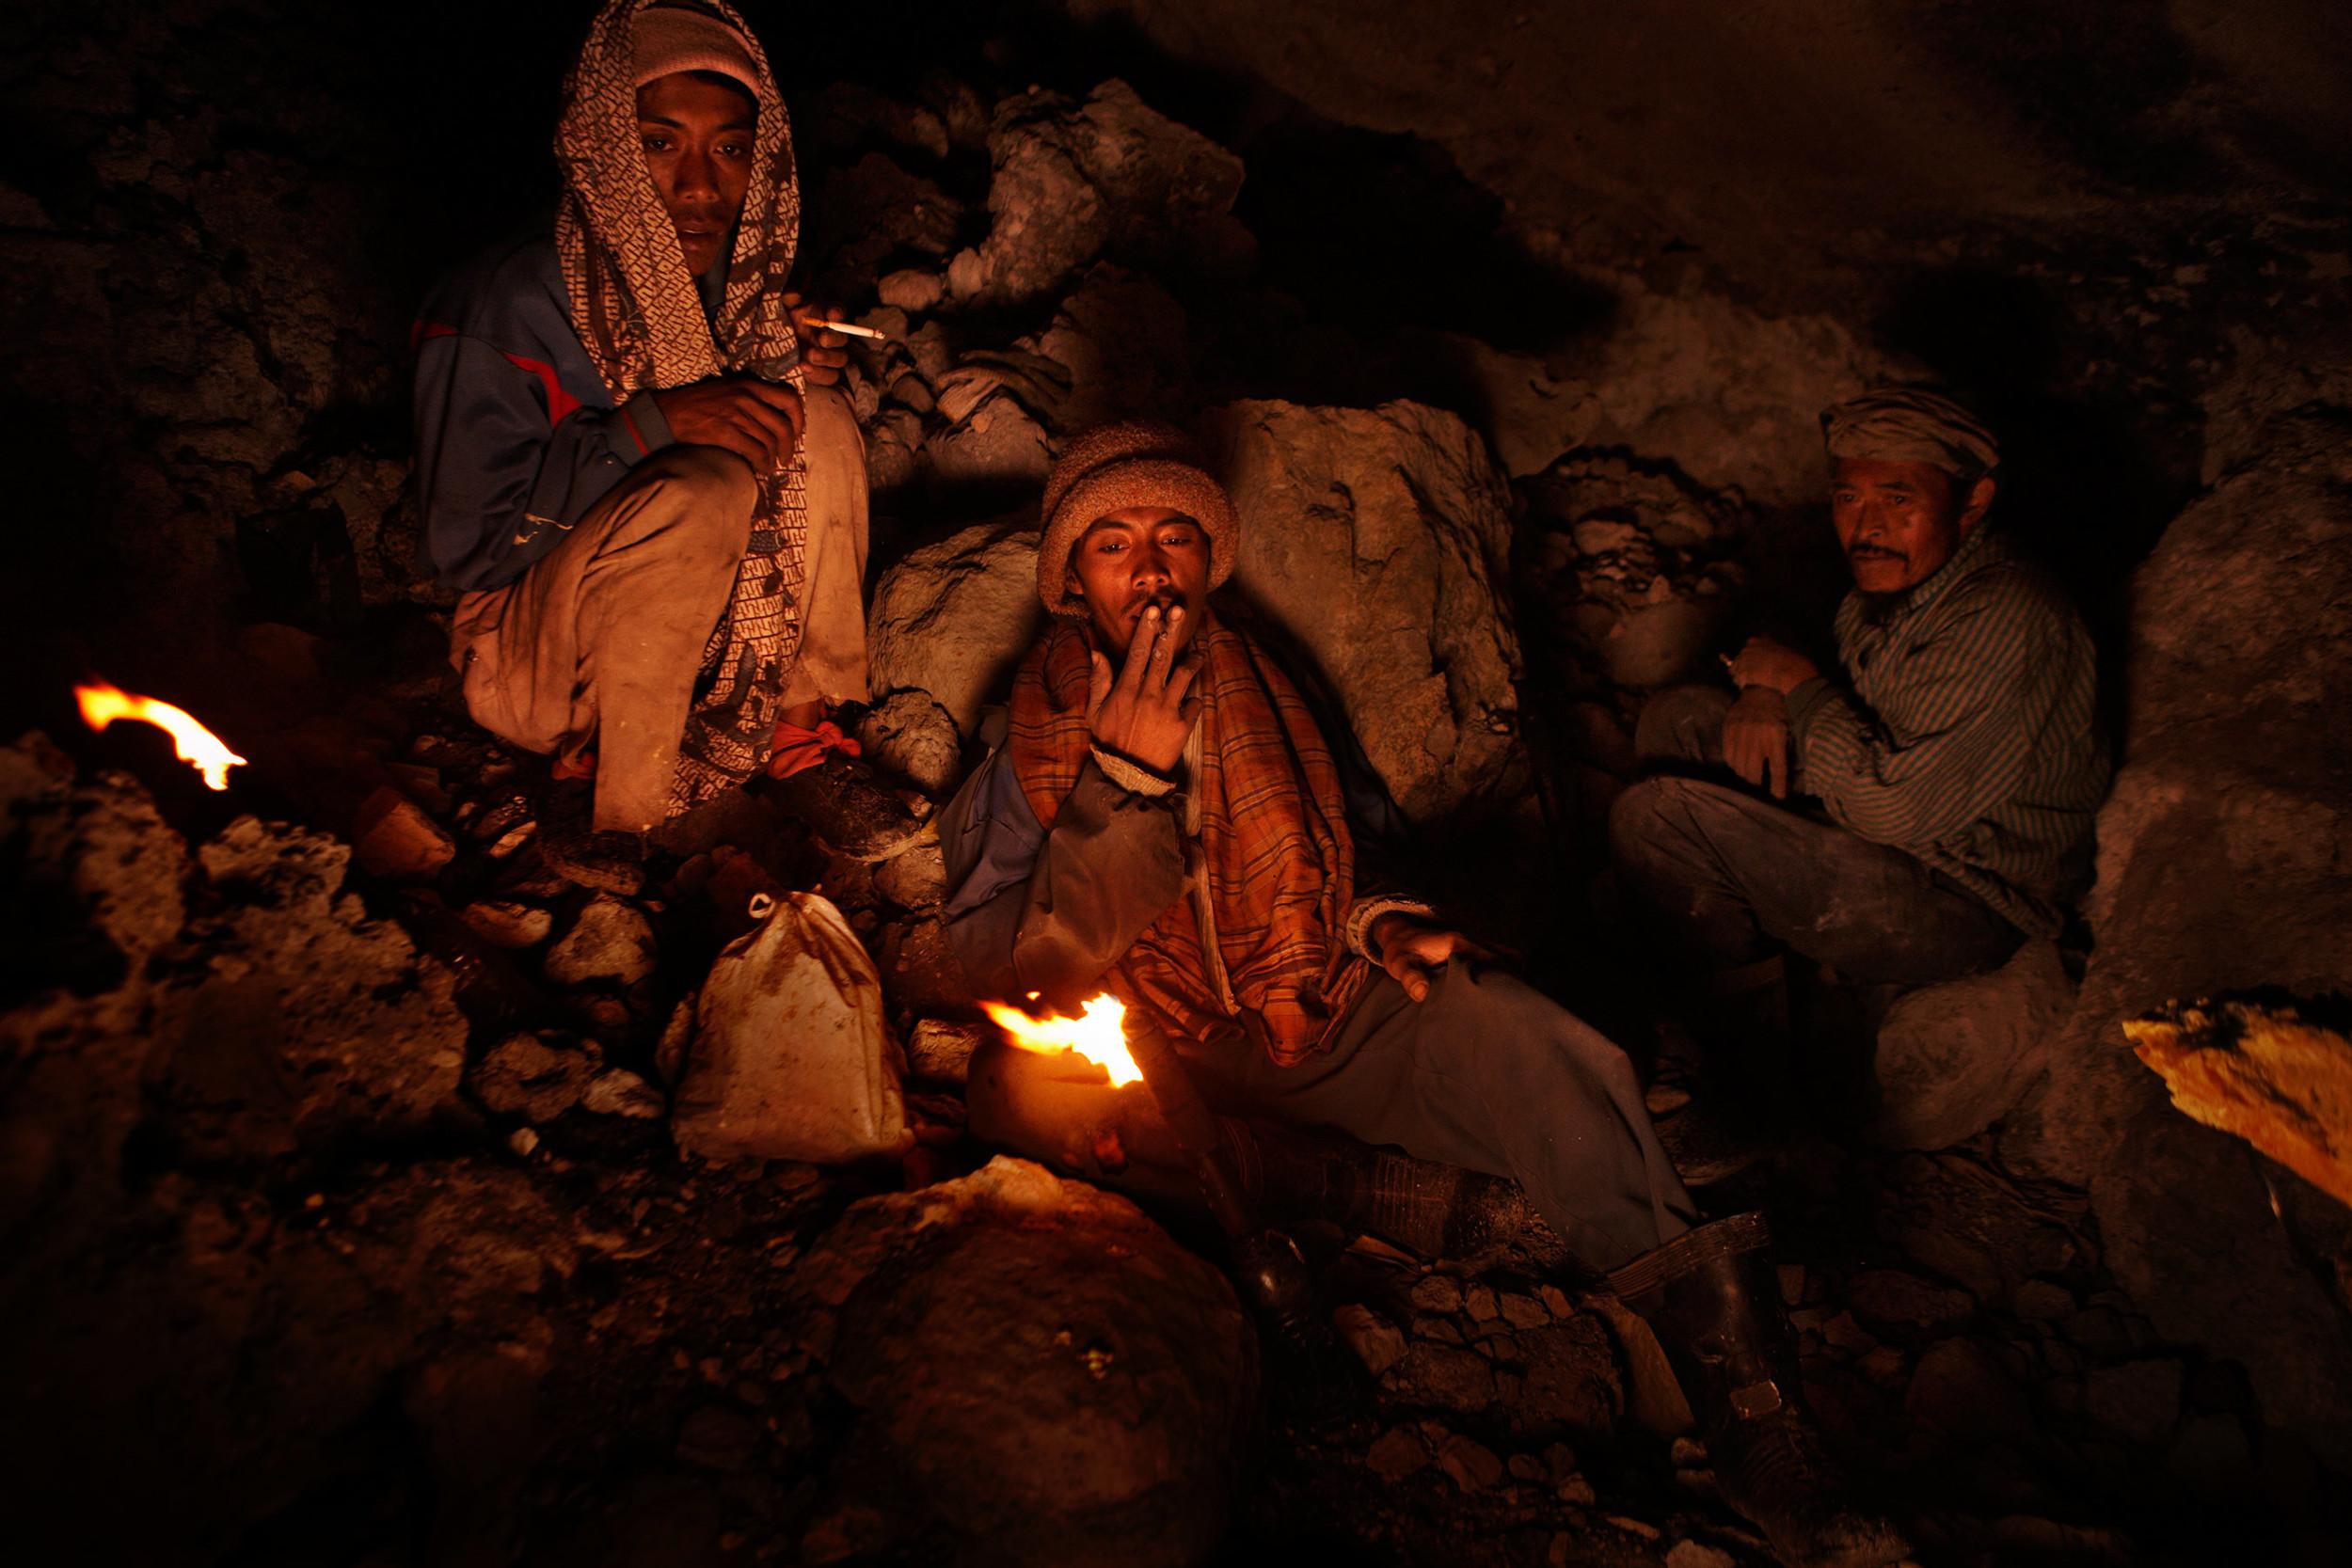 Sulfur miners taking a break before sunrise